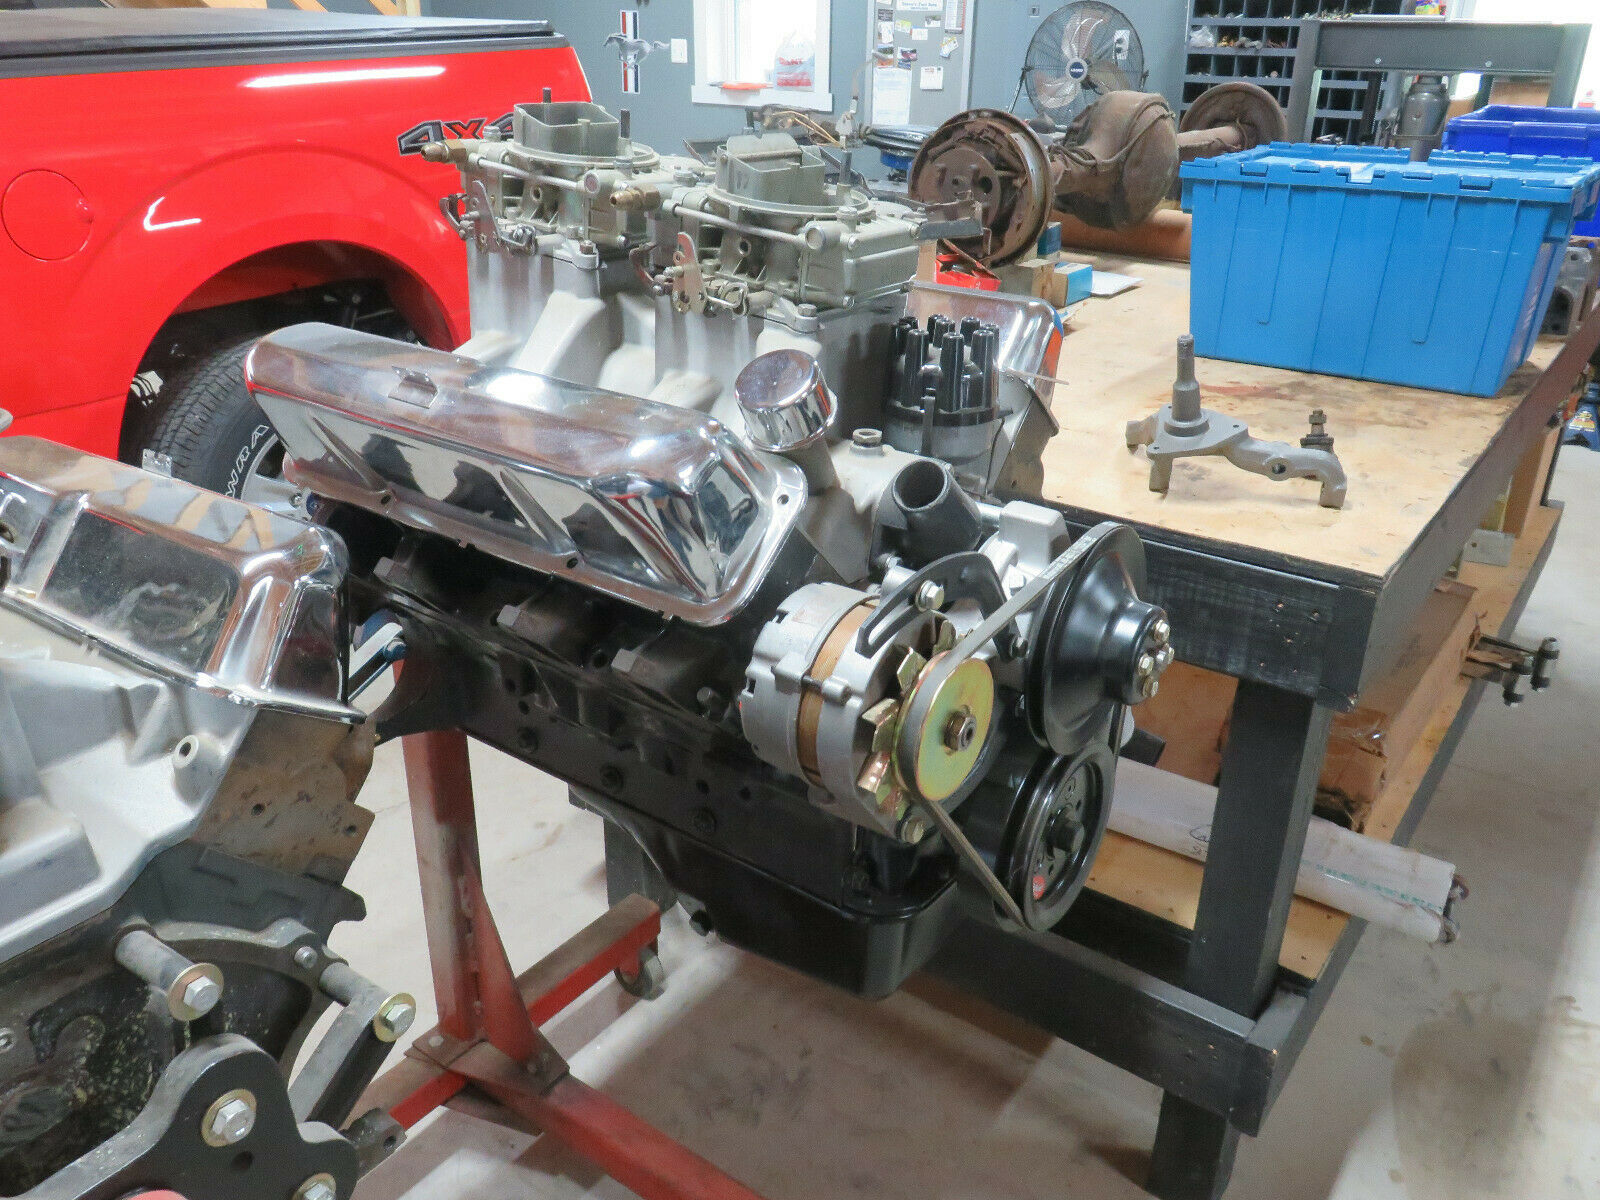 1964 OEM FORD 427 HI RISE ENGINE FORD THUNDERBOLT SIDEOILER